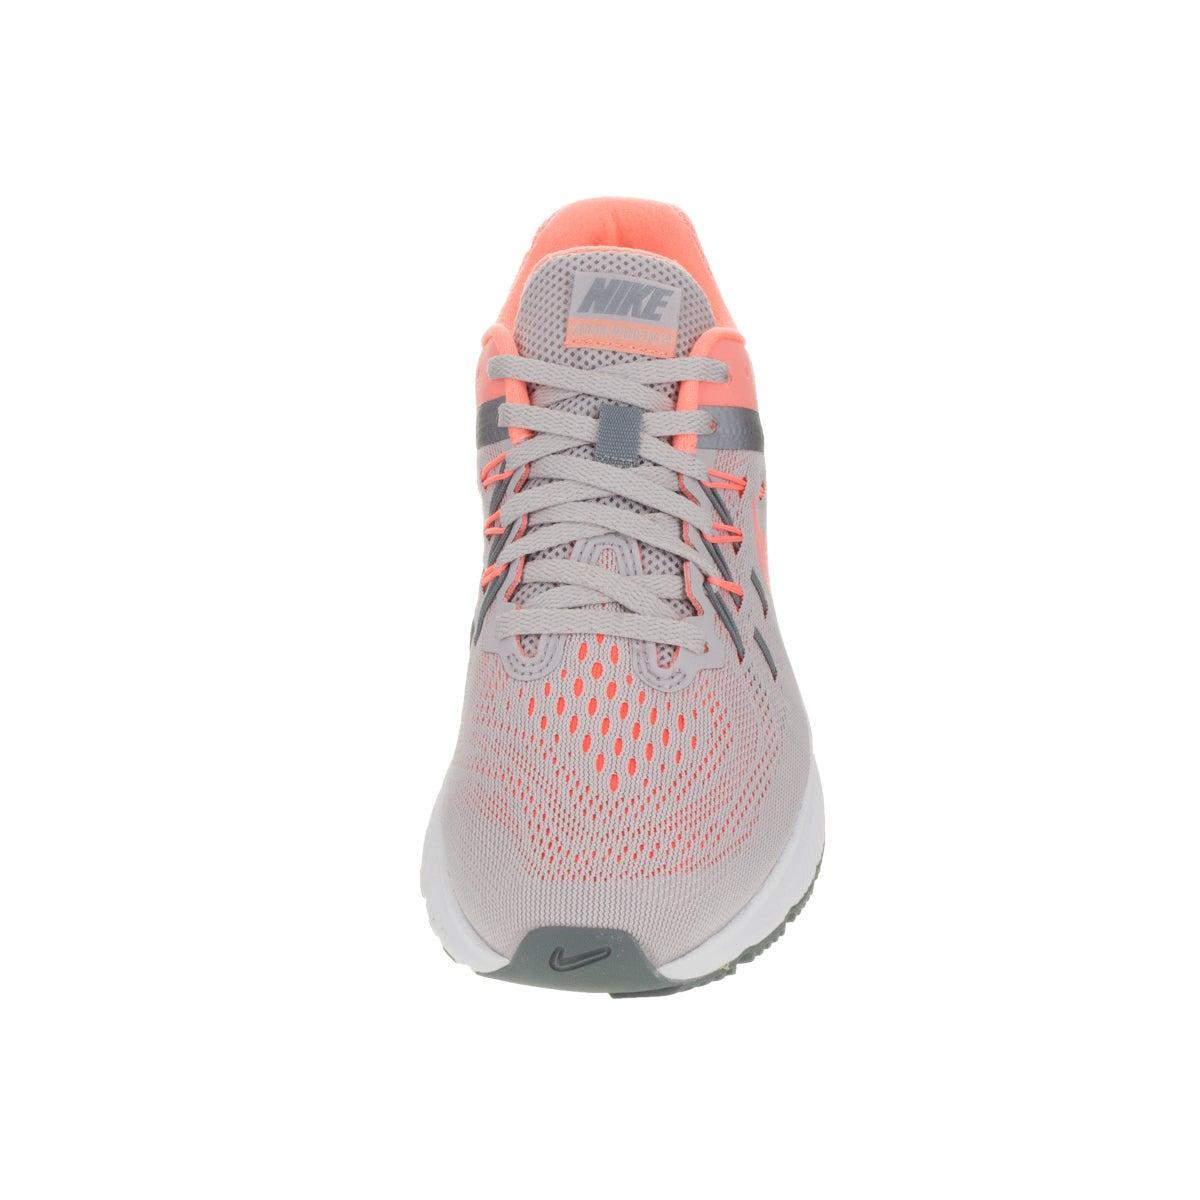 sale retailer 5ee2a 4c8e6 Shop Nike Women s Zoom Winflo 2 Vlt Ash Atmc Pink  Grey C Running Shoe -  Free Shipping Today - Overstock - 12328884